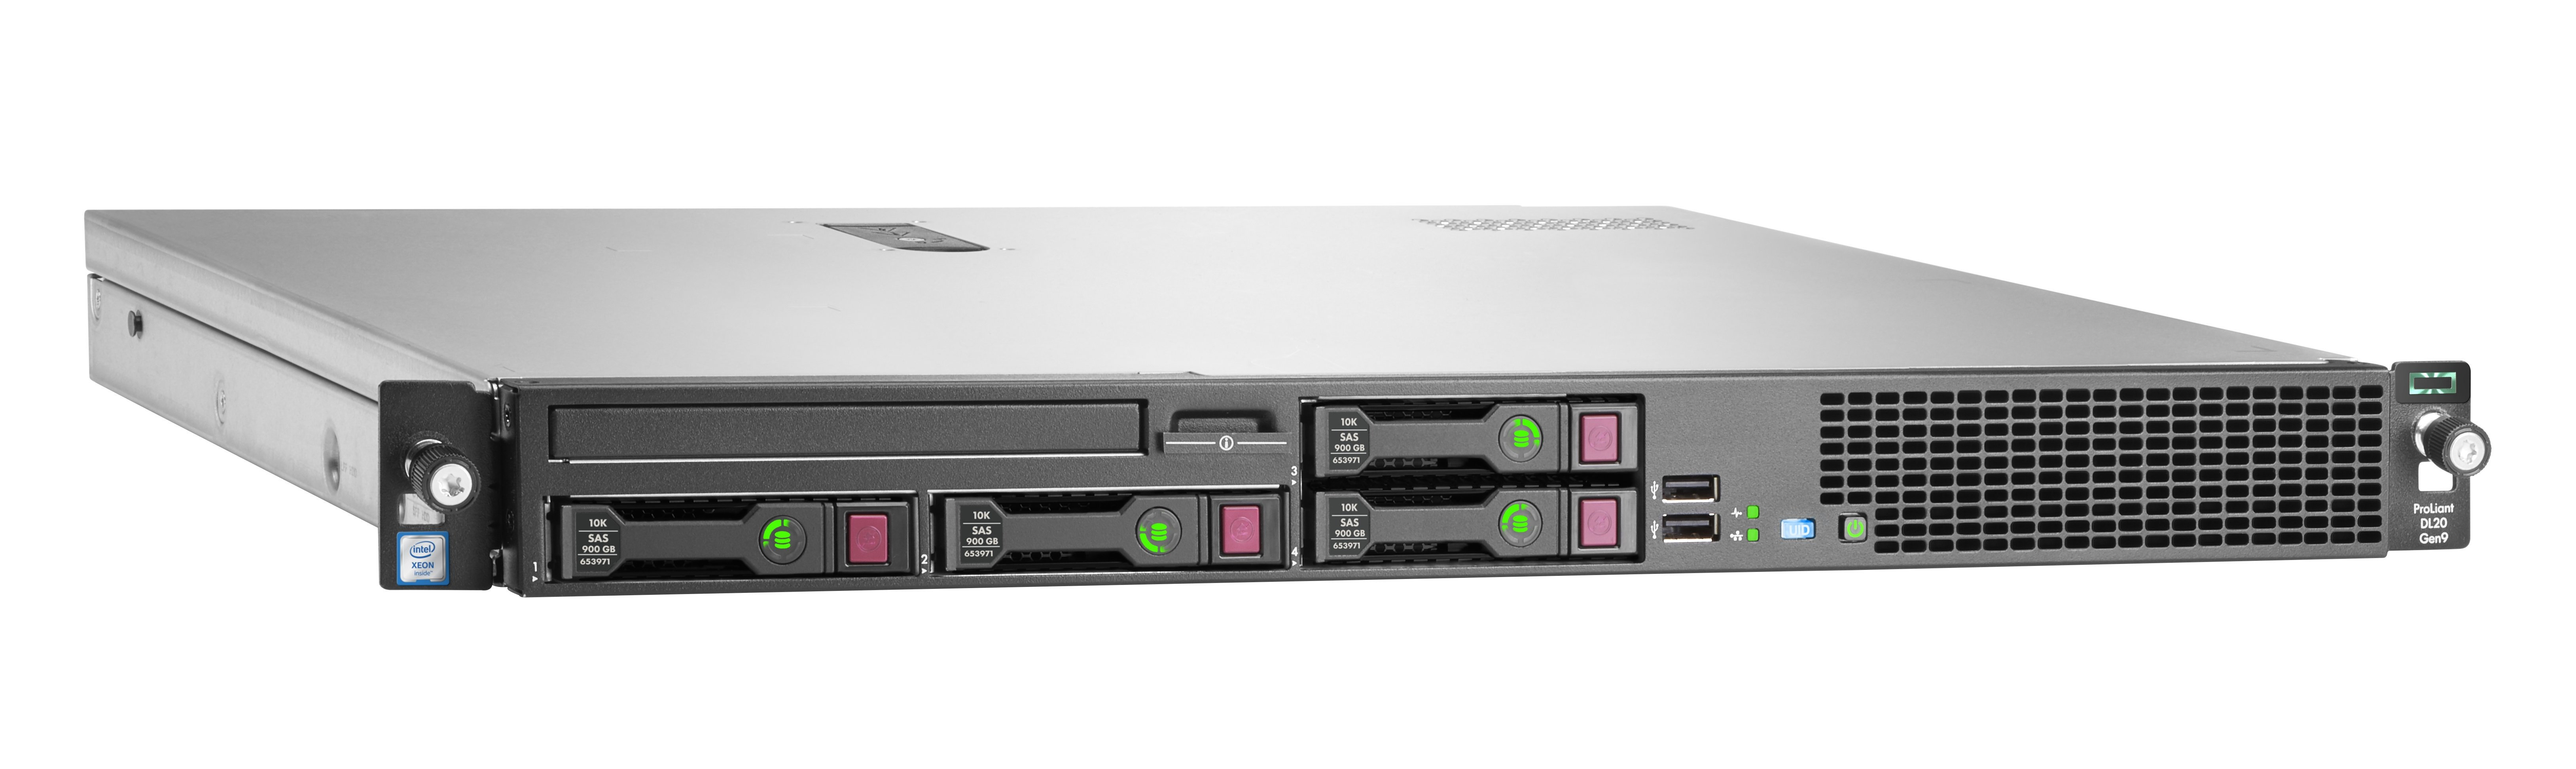 HPE DL20 Gen9 E3-1230v6 4SFF Soln Svr